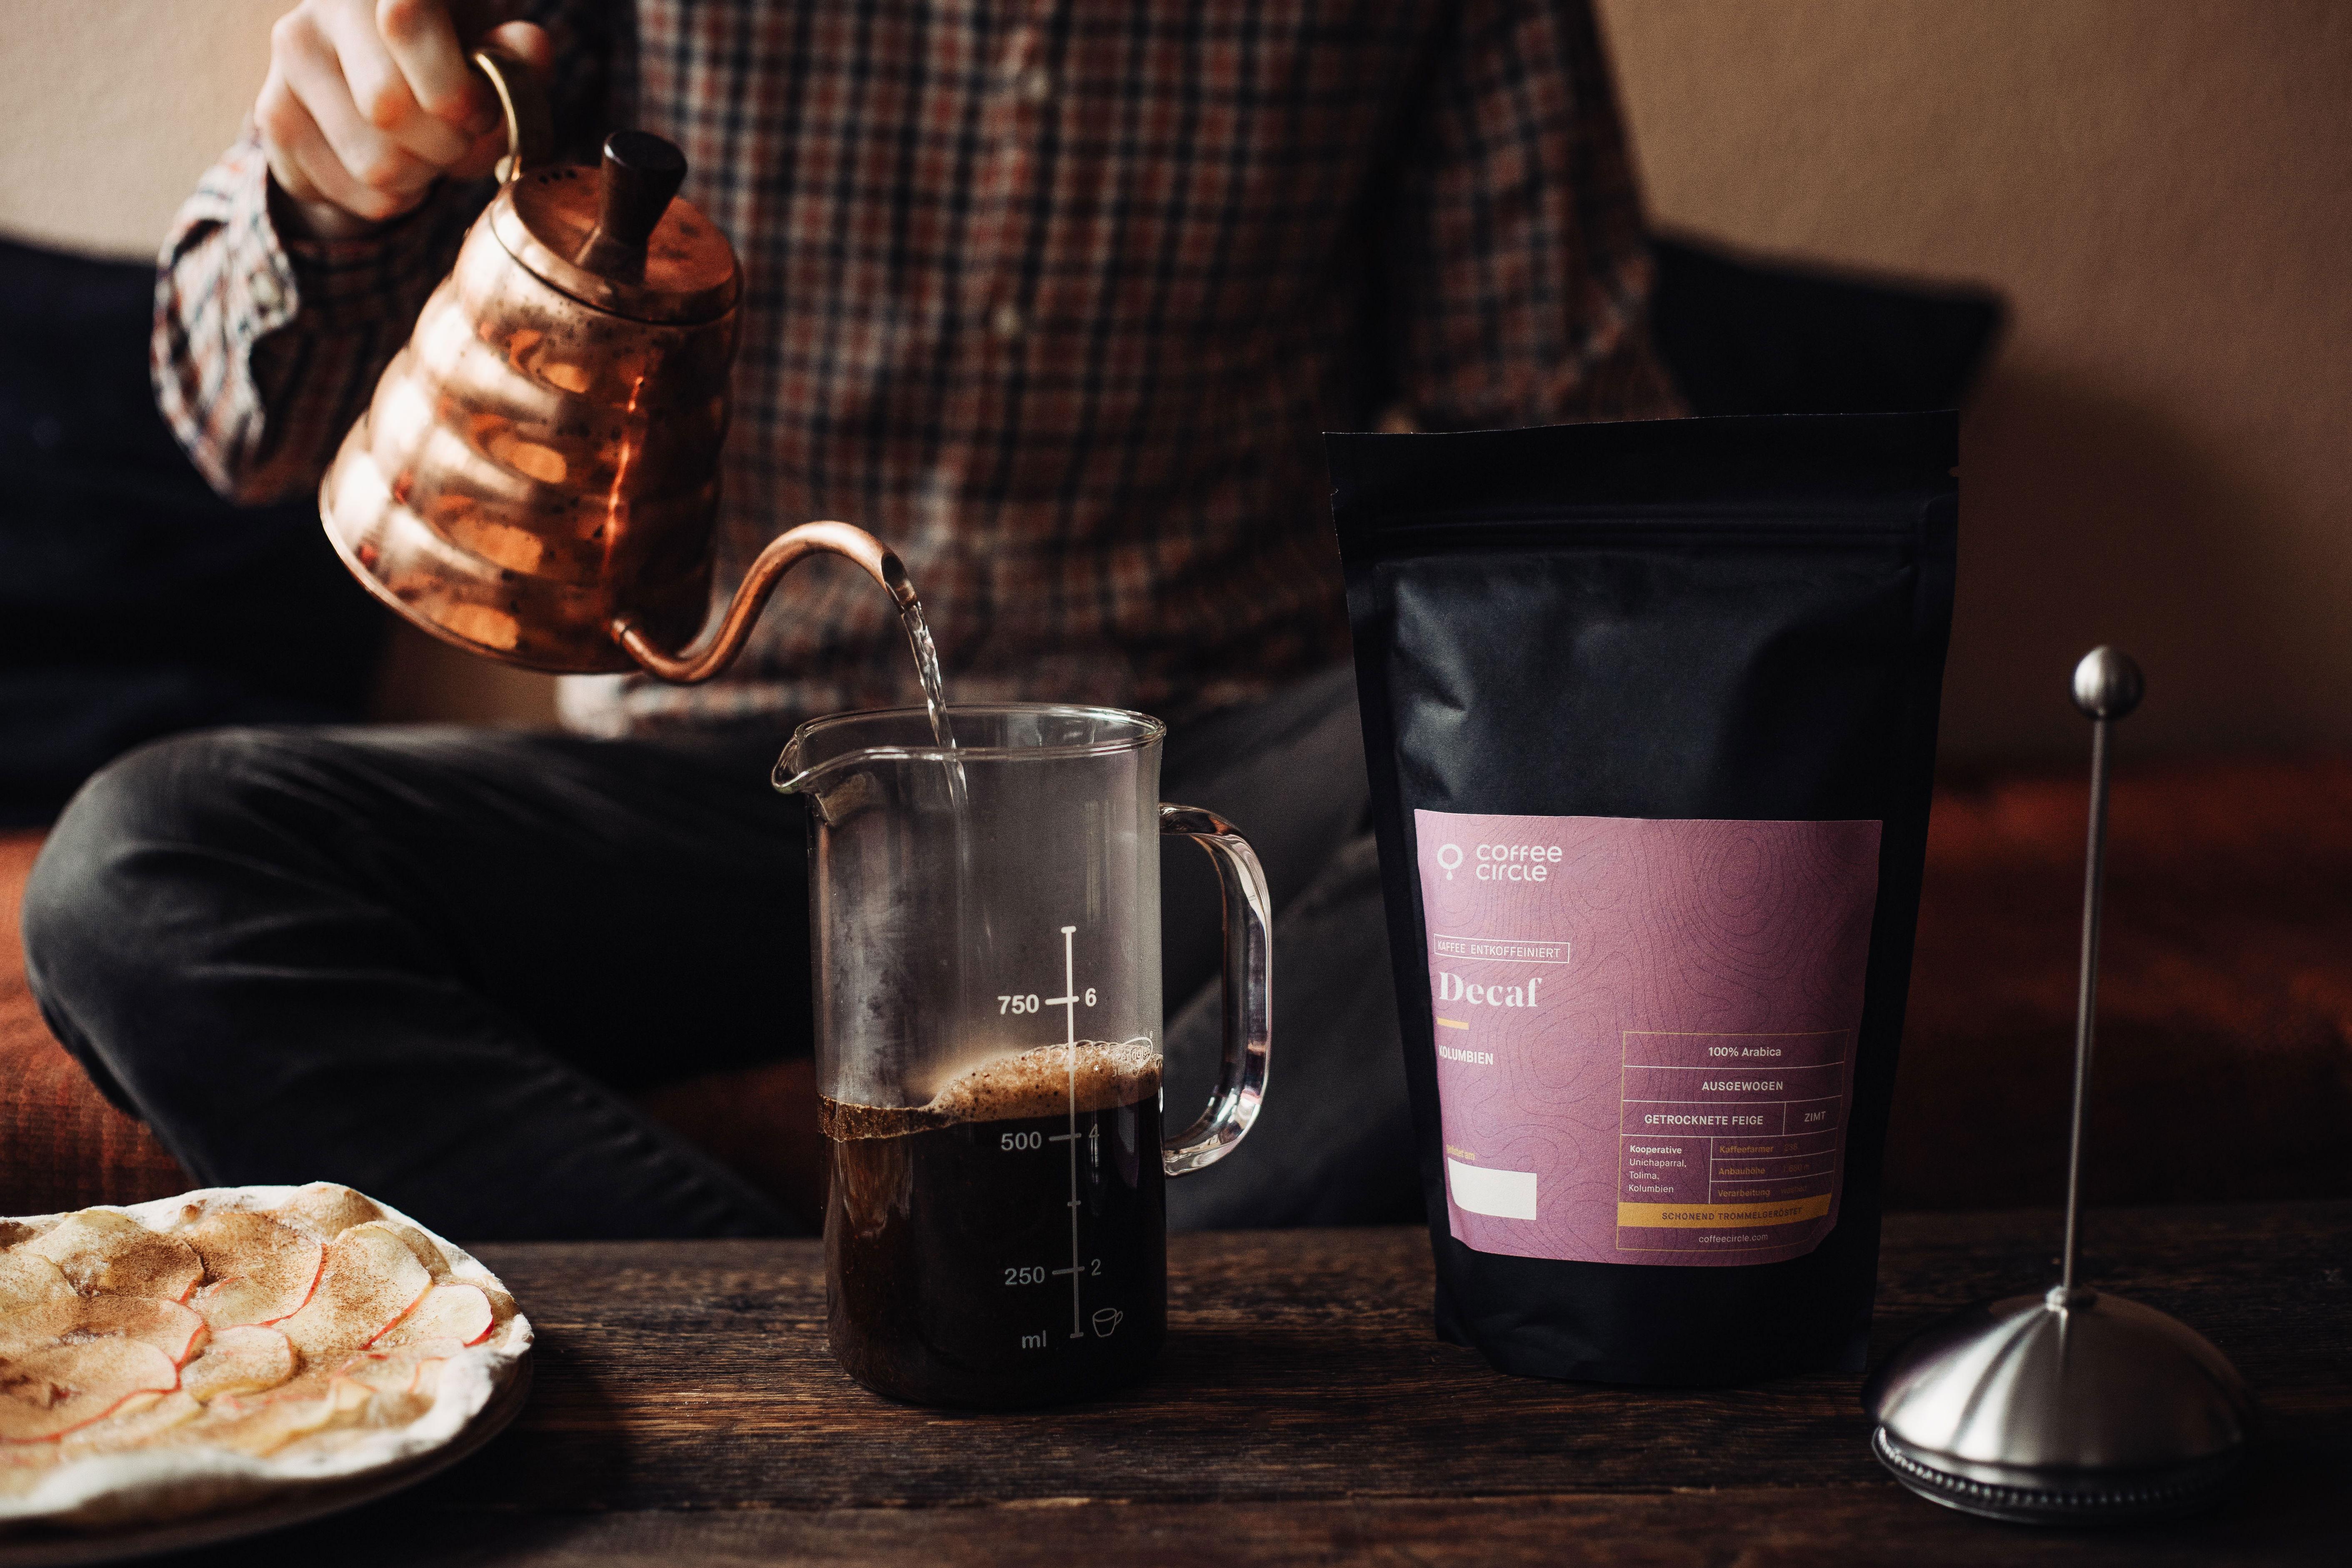 Decaf Filterkaffe mit French Press und Hario buono